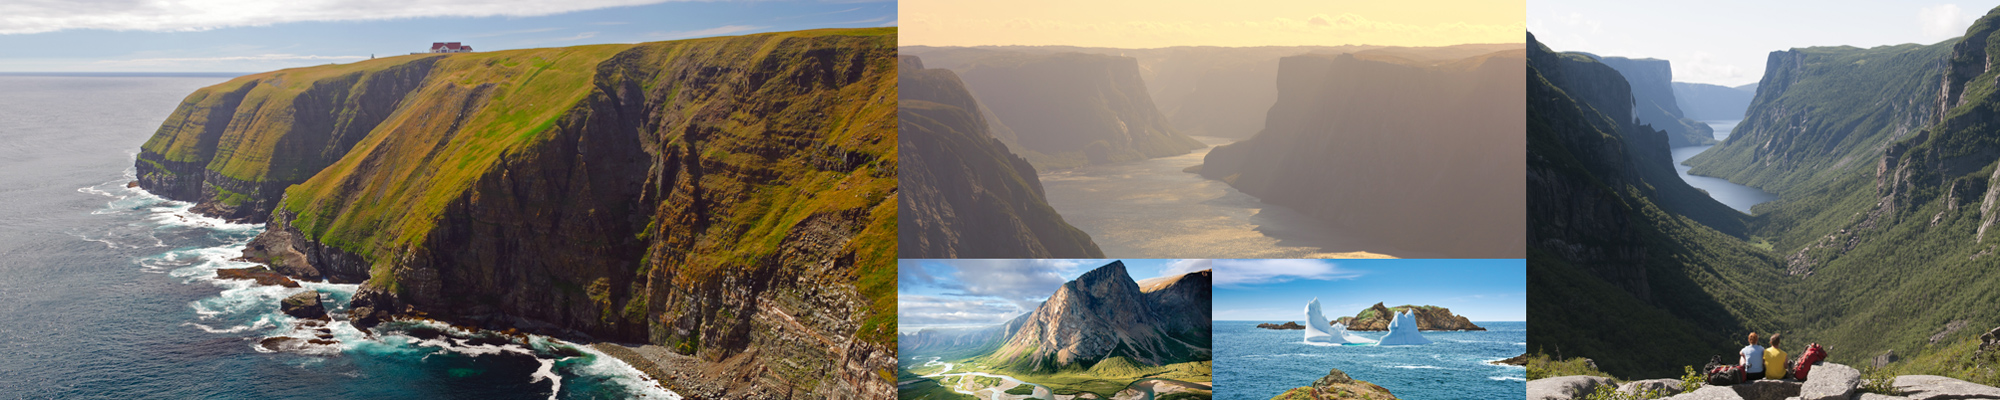 Parco Nazionale di Gros Morne Canada